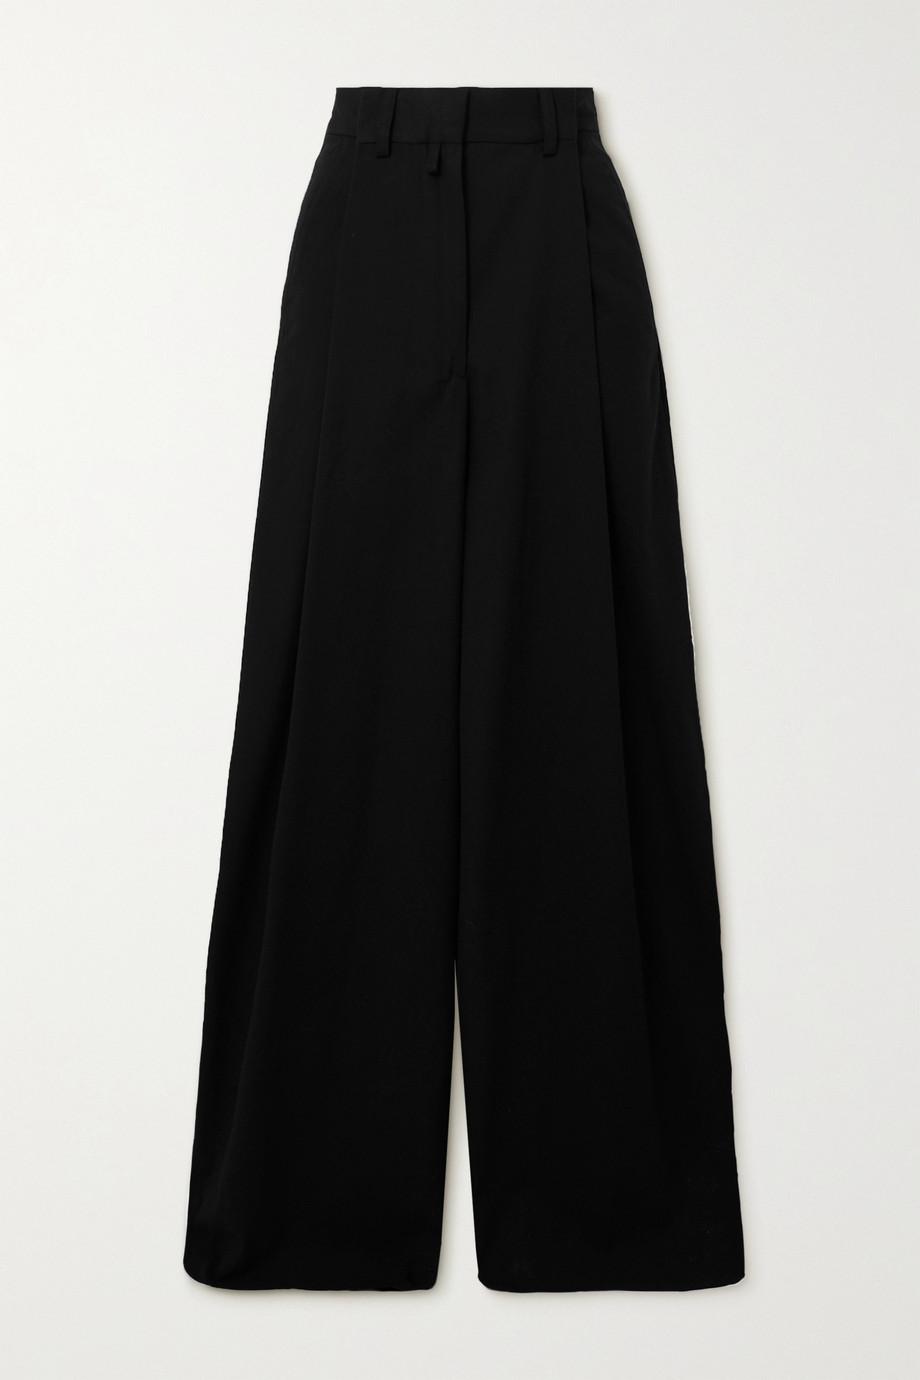 Dries Van Noten Pleated cotton-blend twill wide-leg pants